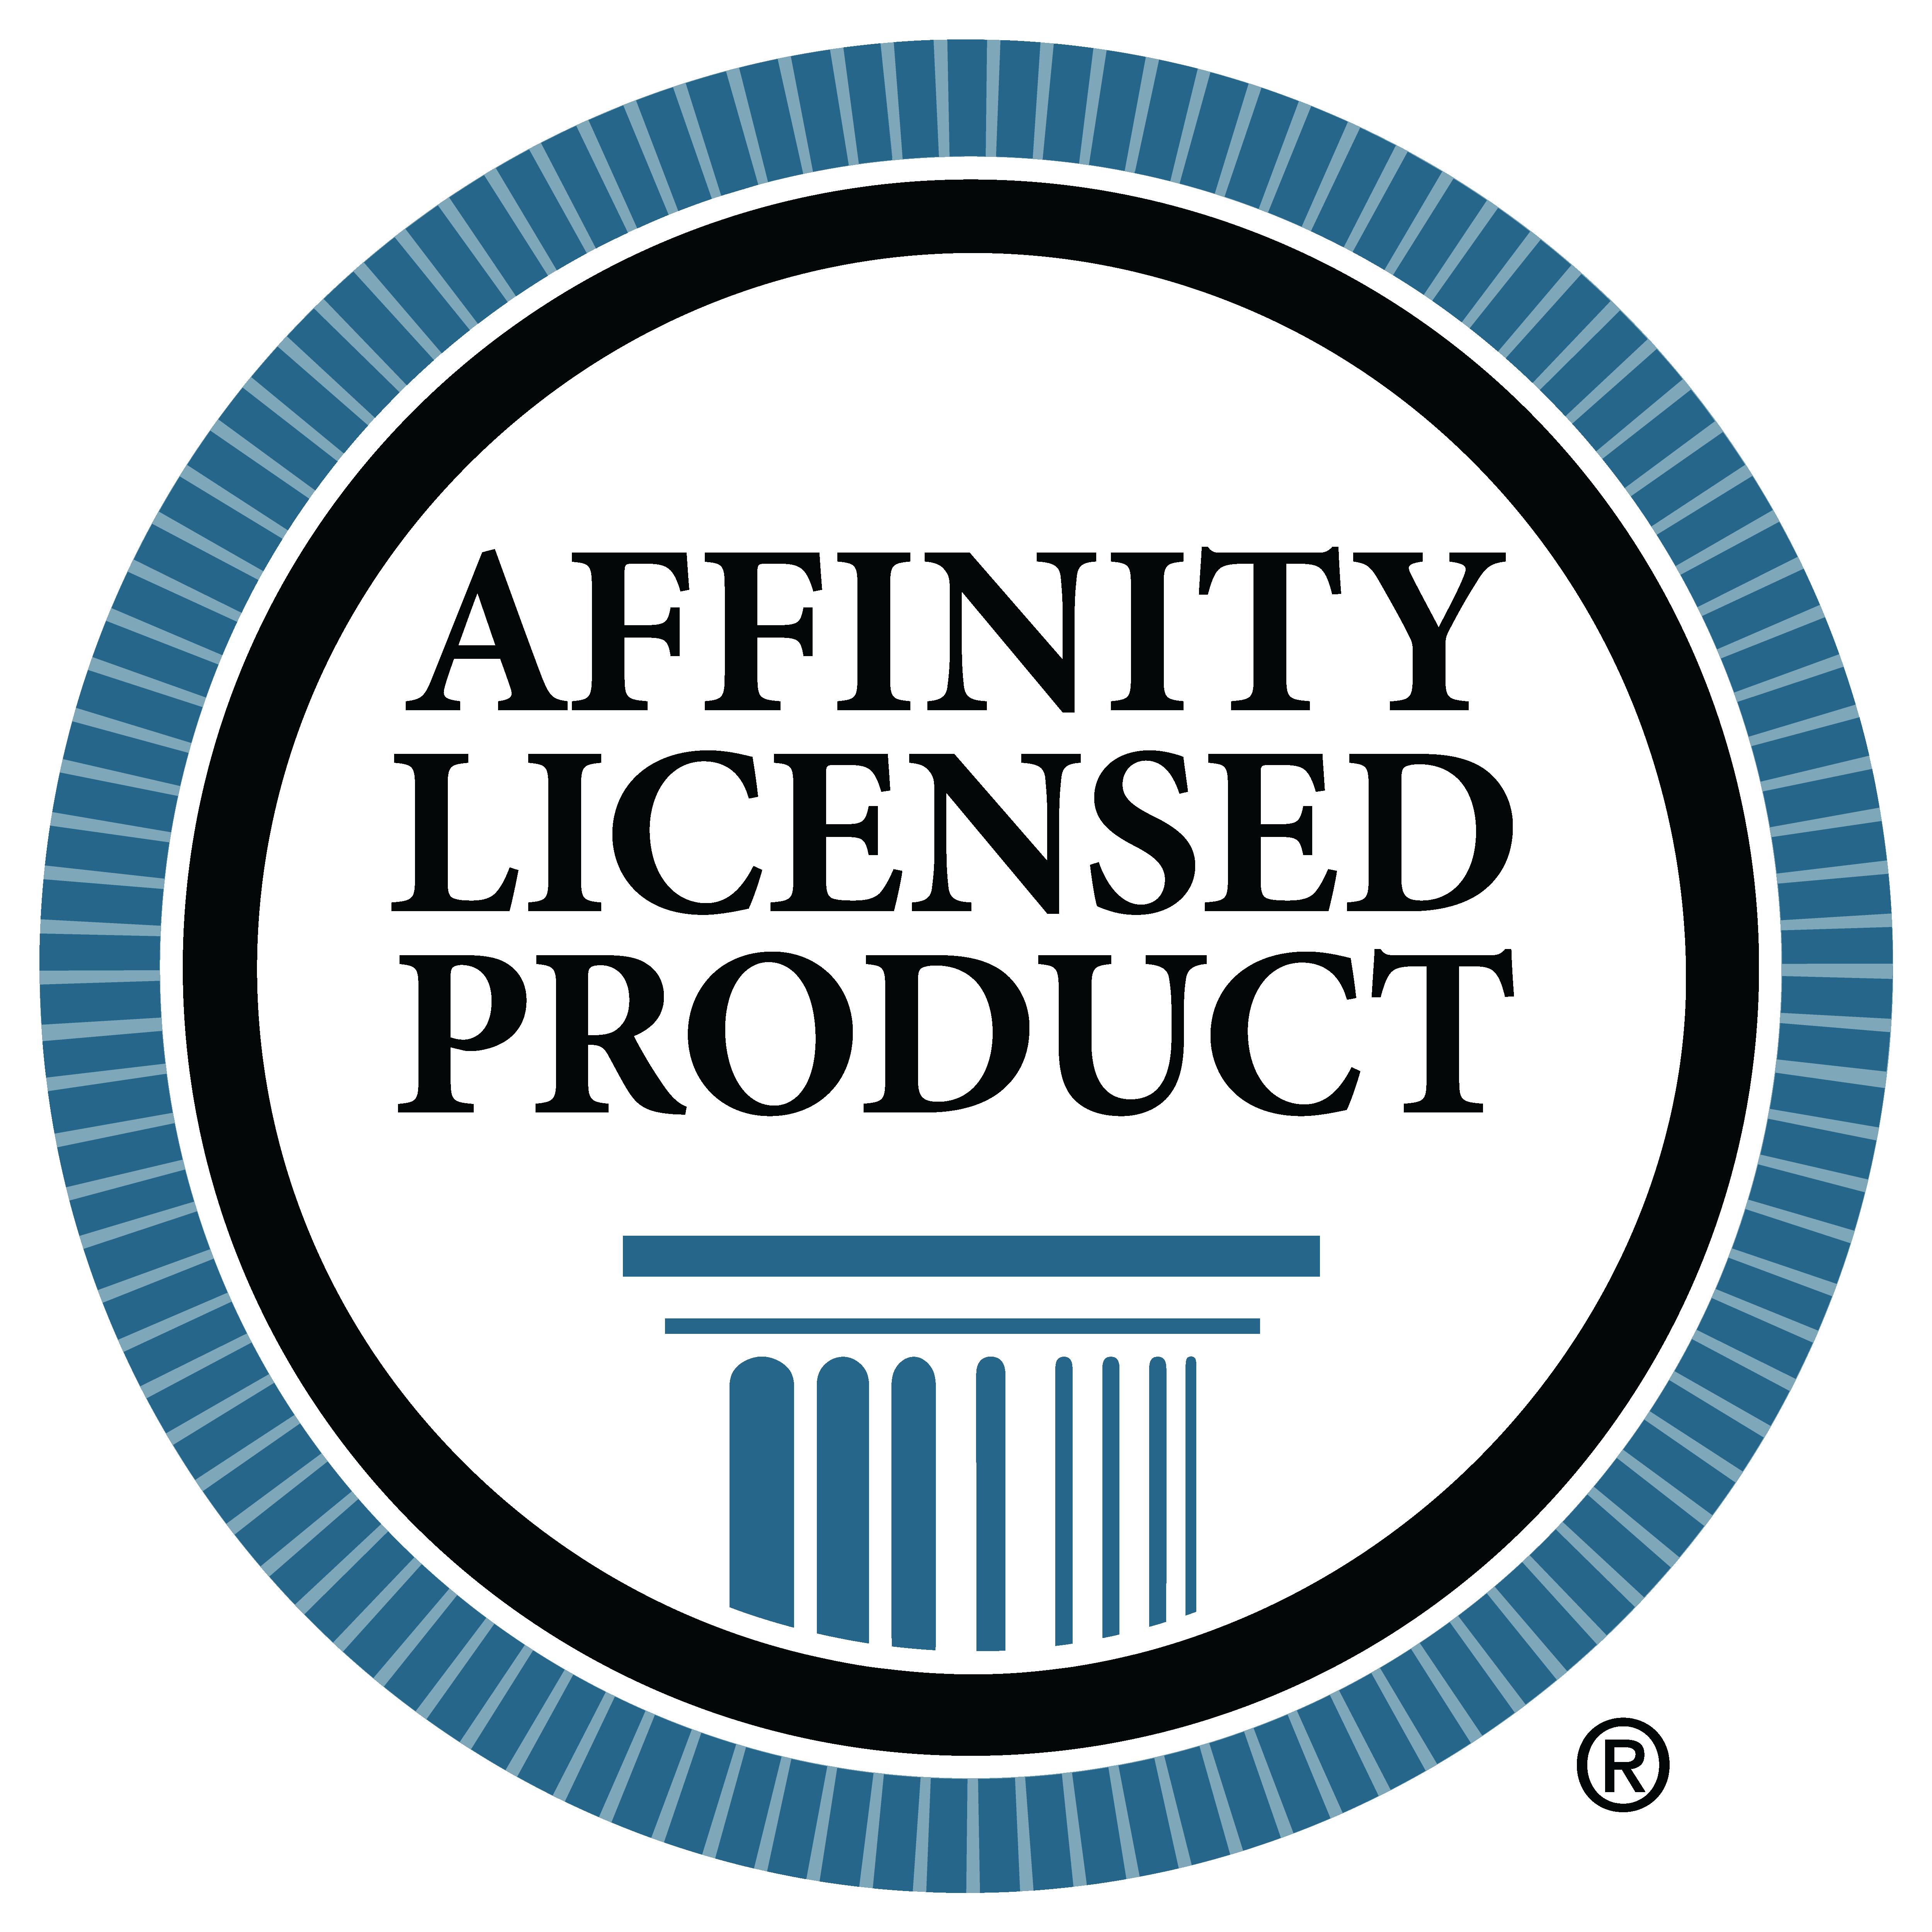 affinity-color-alp-seal-image-png-.png